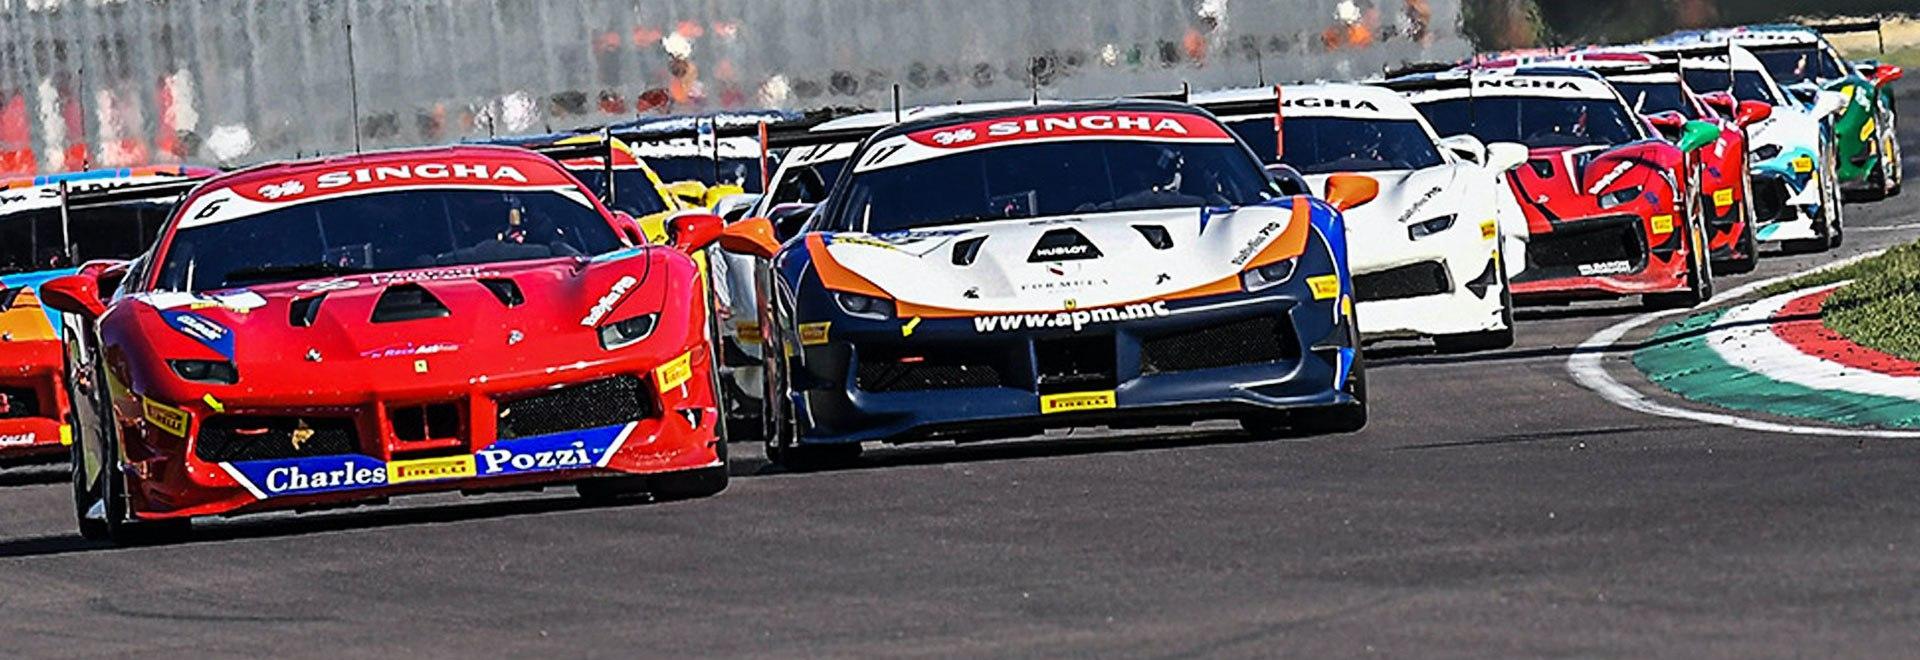 Coppa Shell Spa-Francorchamps. Gara 1